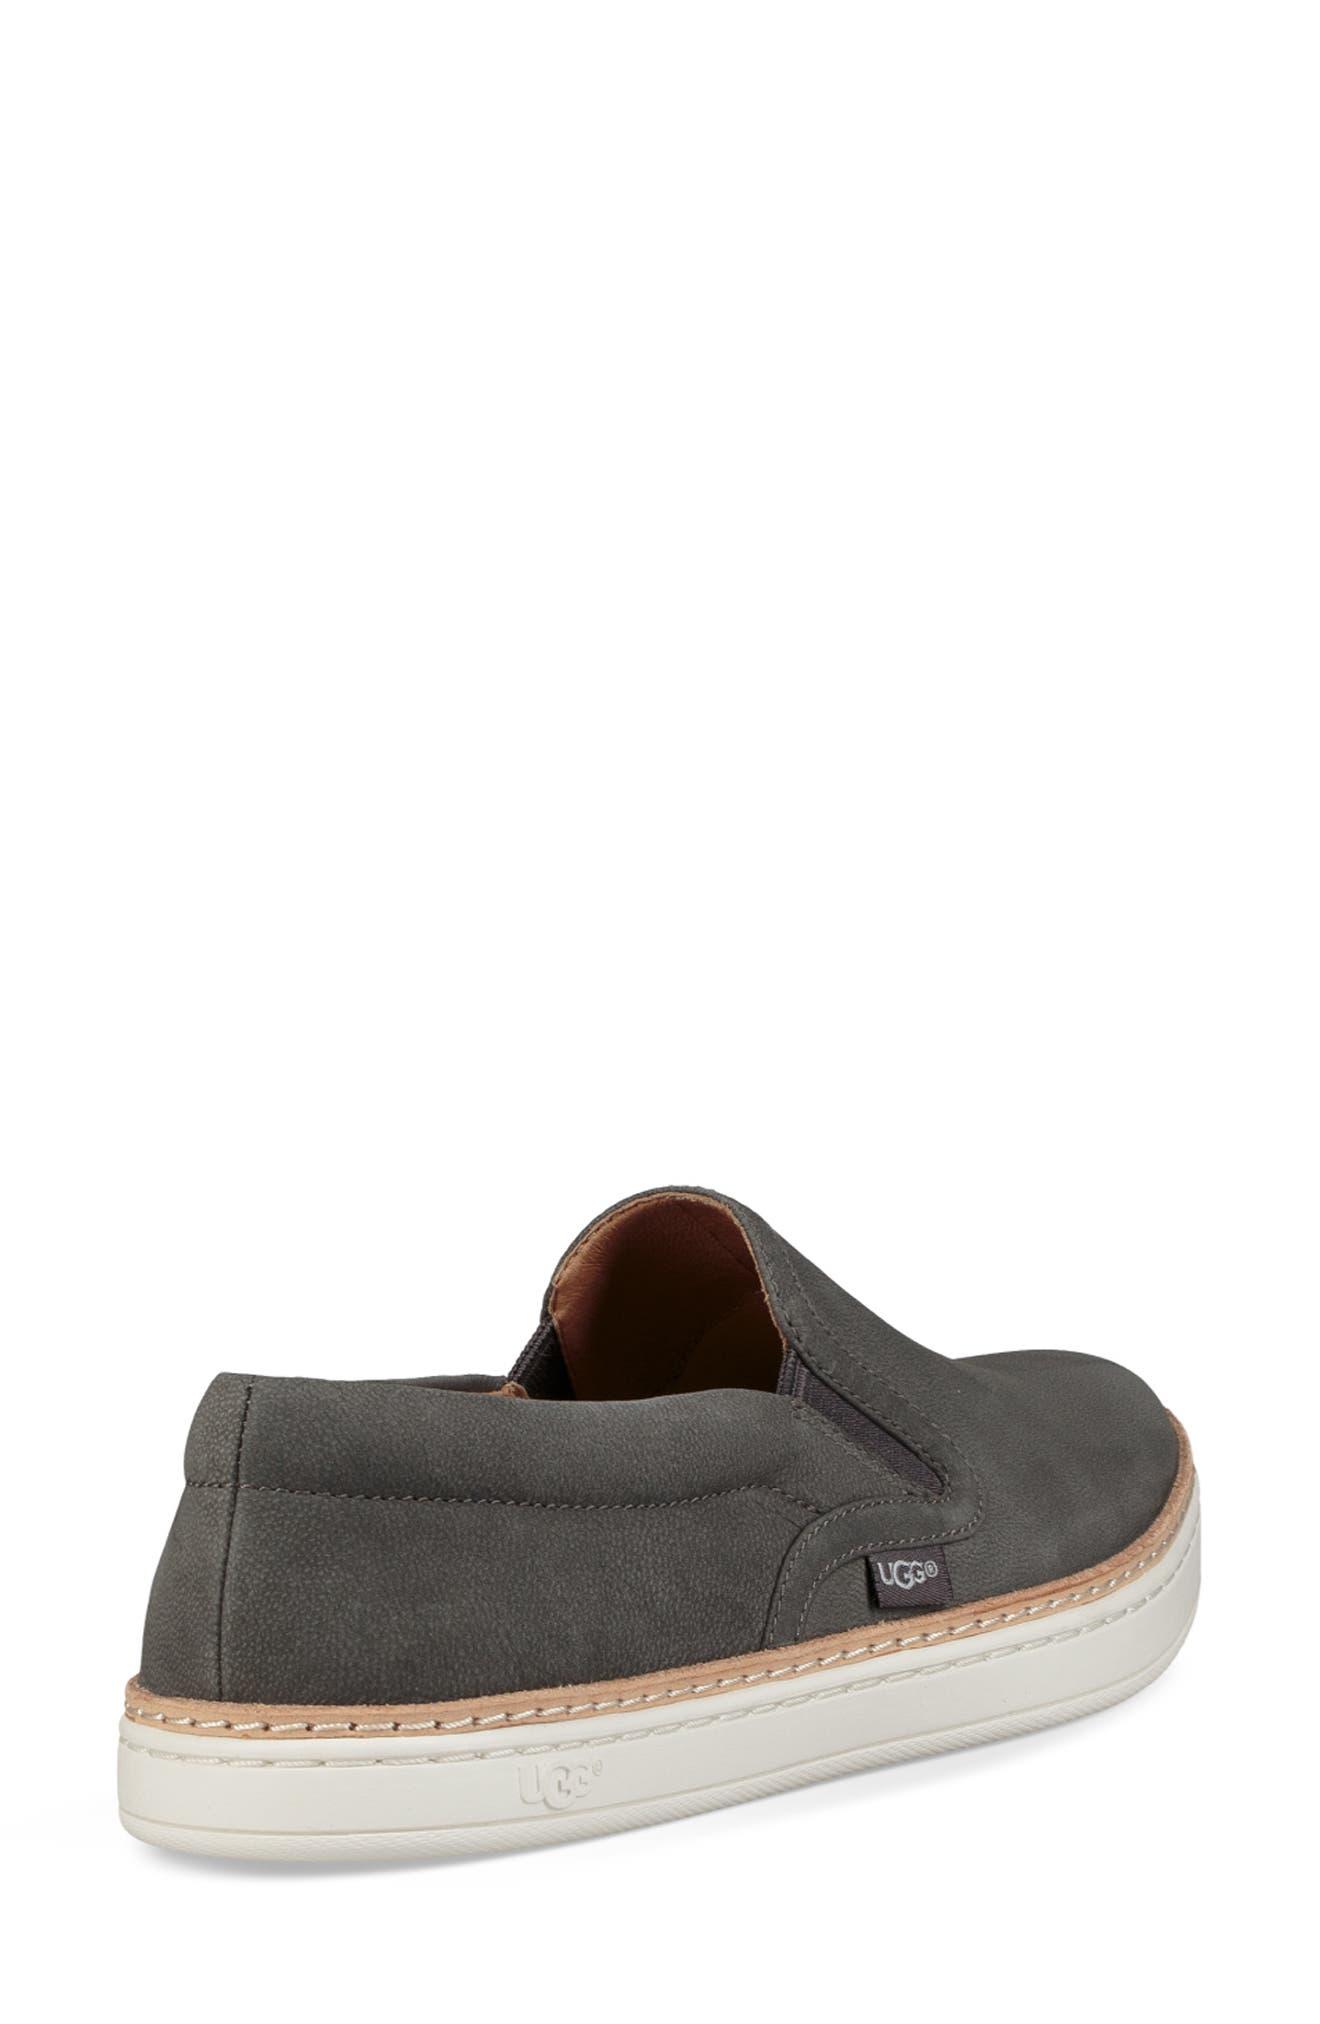 Soleda Slip-On Sneaker,                             Alternate thumbnail 2, color,                             CHARCOAL LEATHER